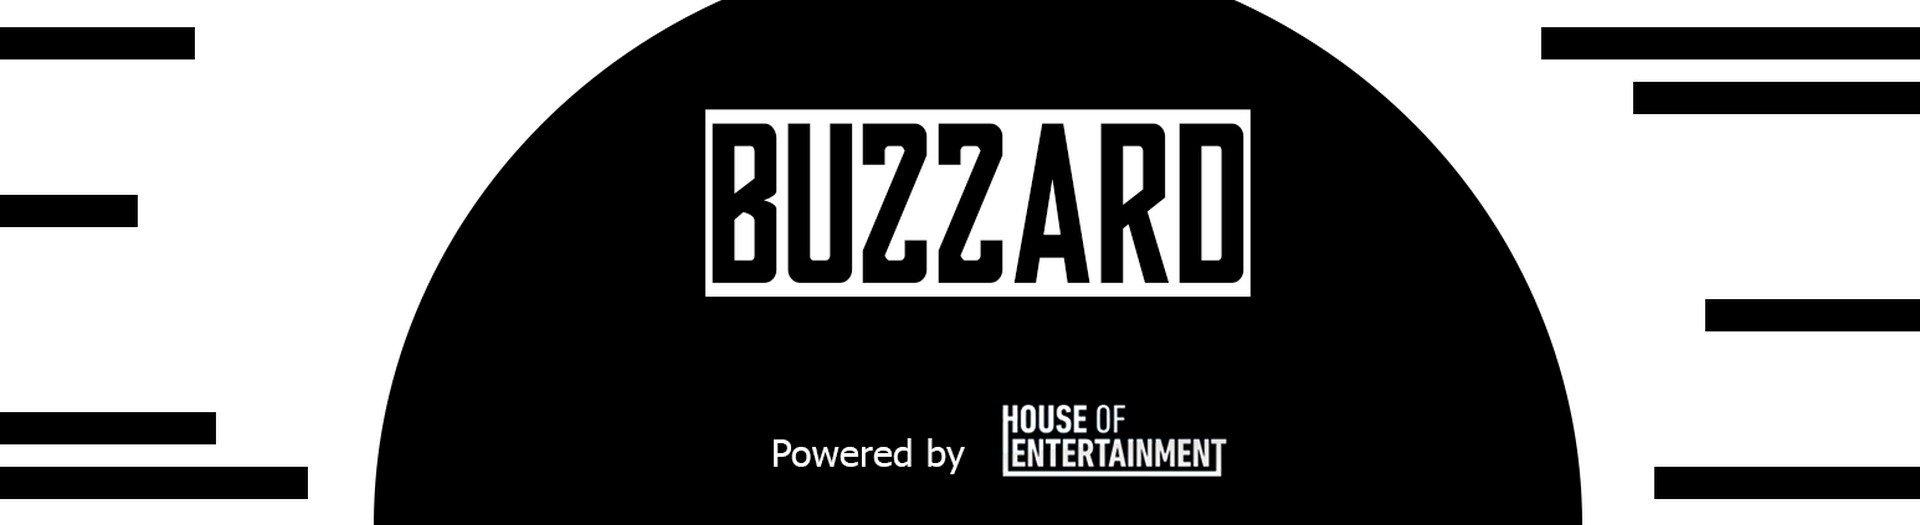 Jens Vollens maakt liedje over Donald Trump - Logo Buzzard 2